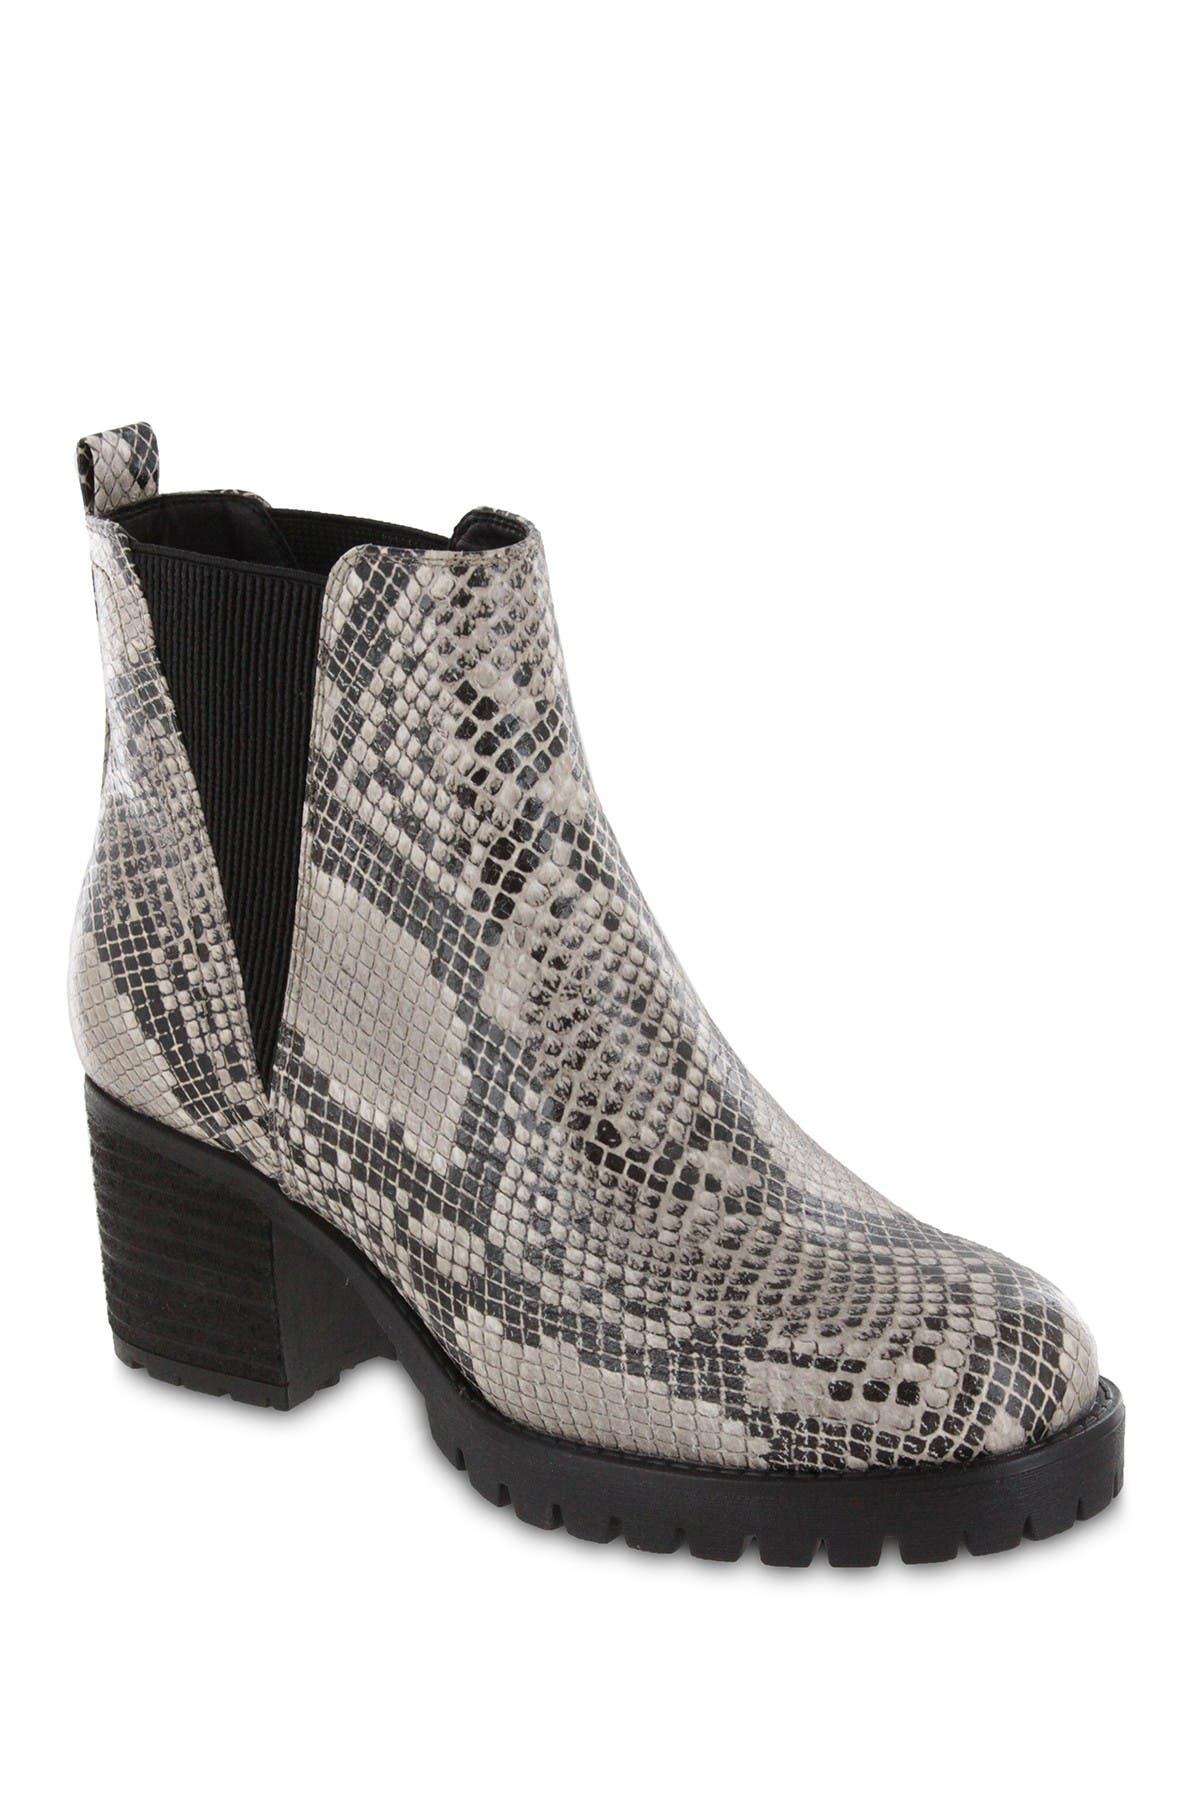 Image of MIA Jody Snake Embossed Platform Boot